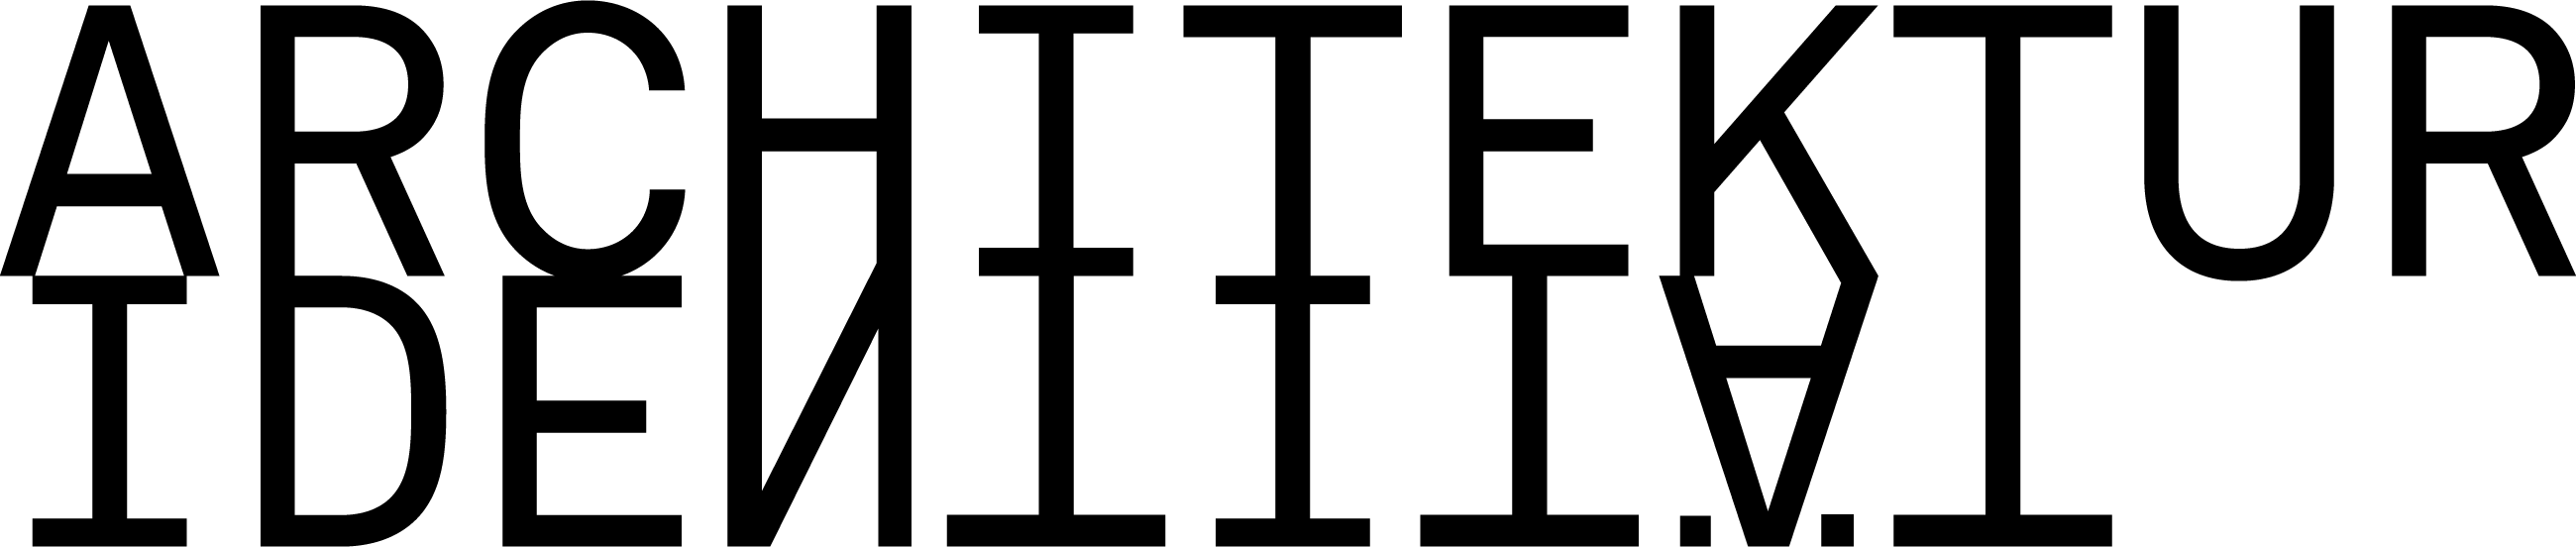 kap_architekturidentitaet-header